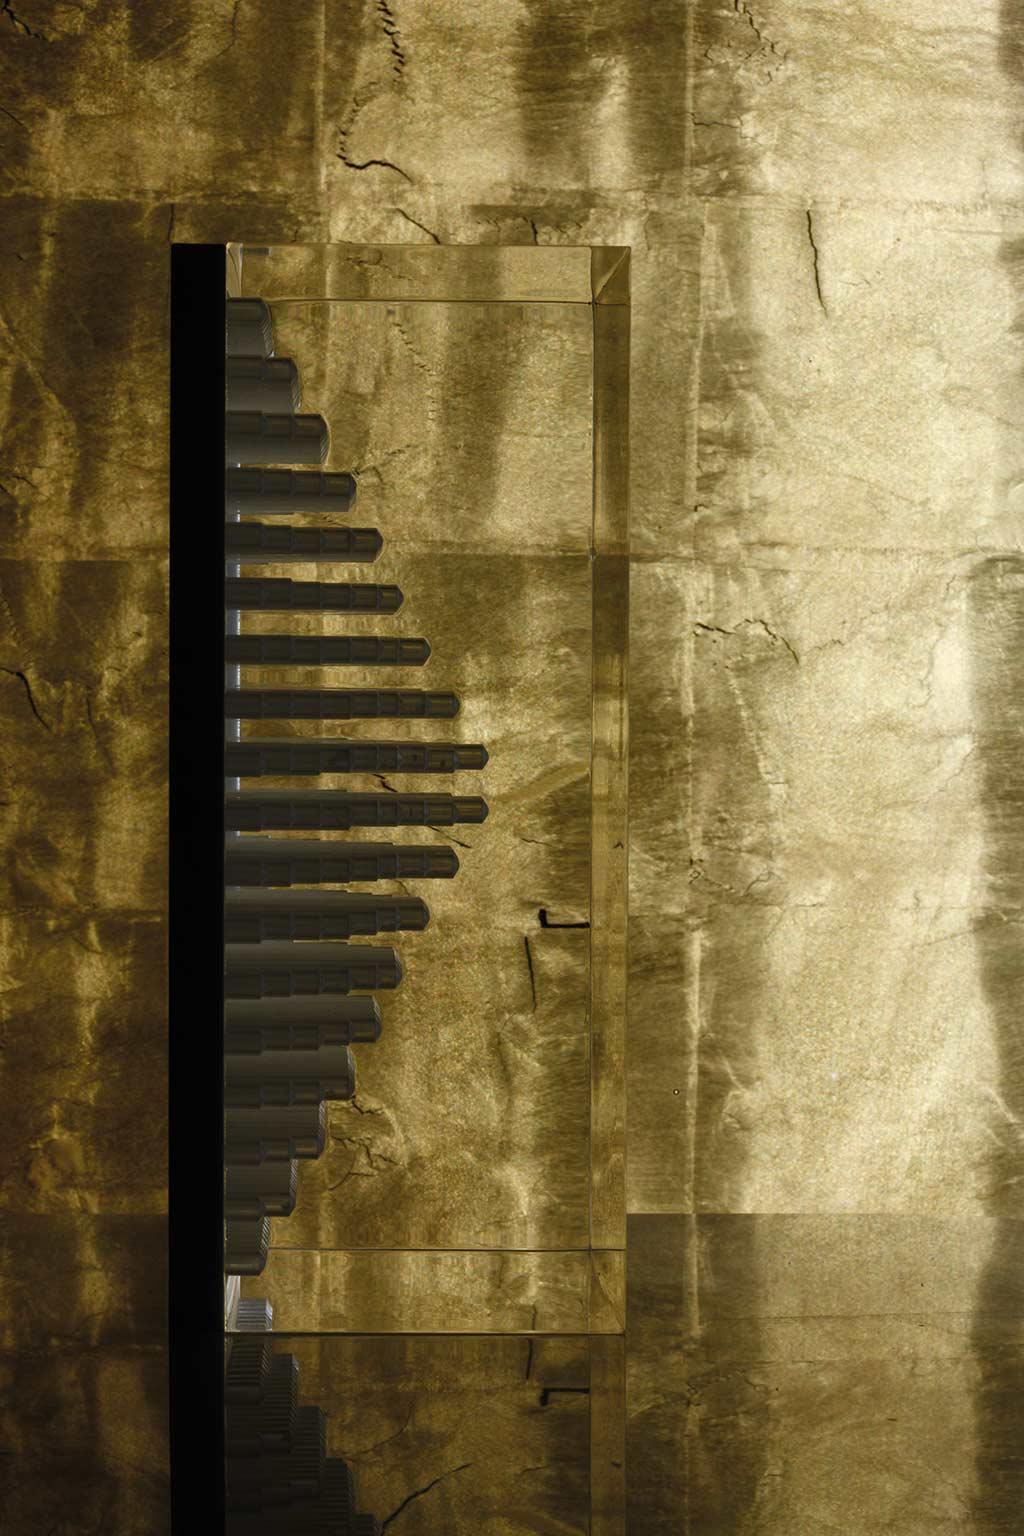 Płytki weilkoformatowe Rex seria Gold